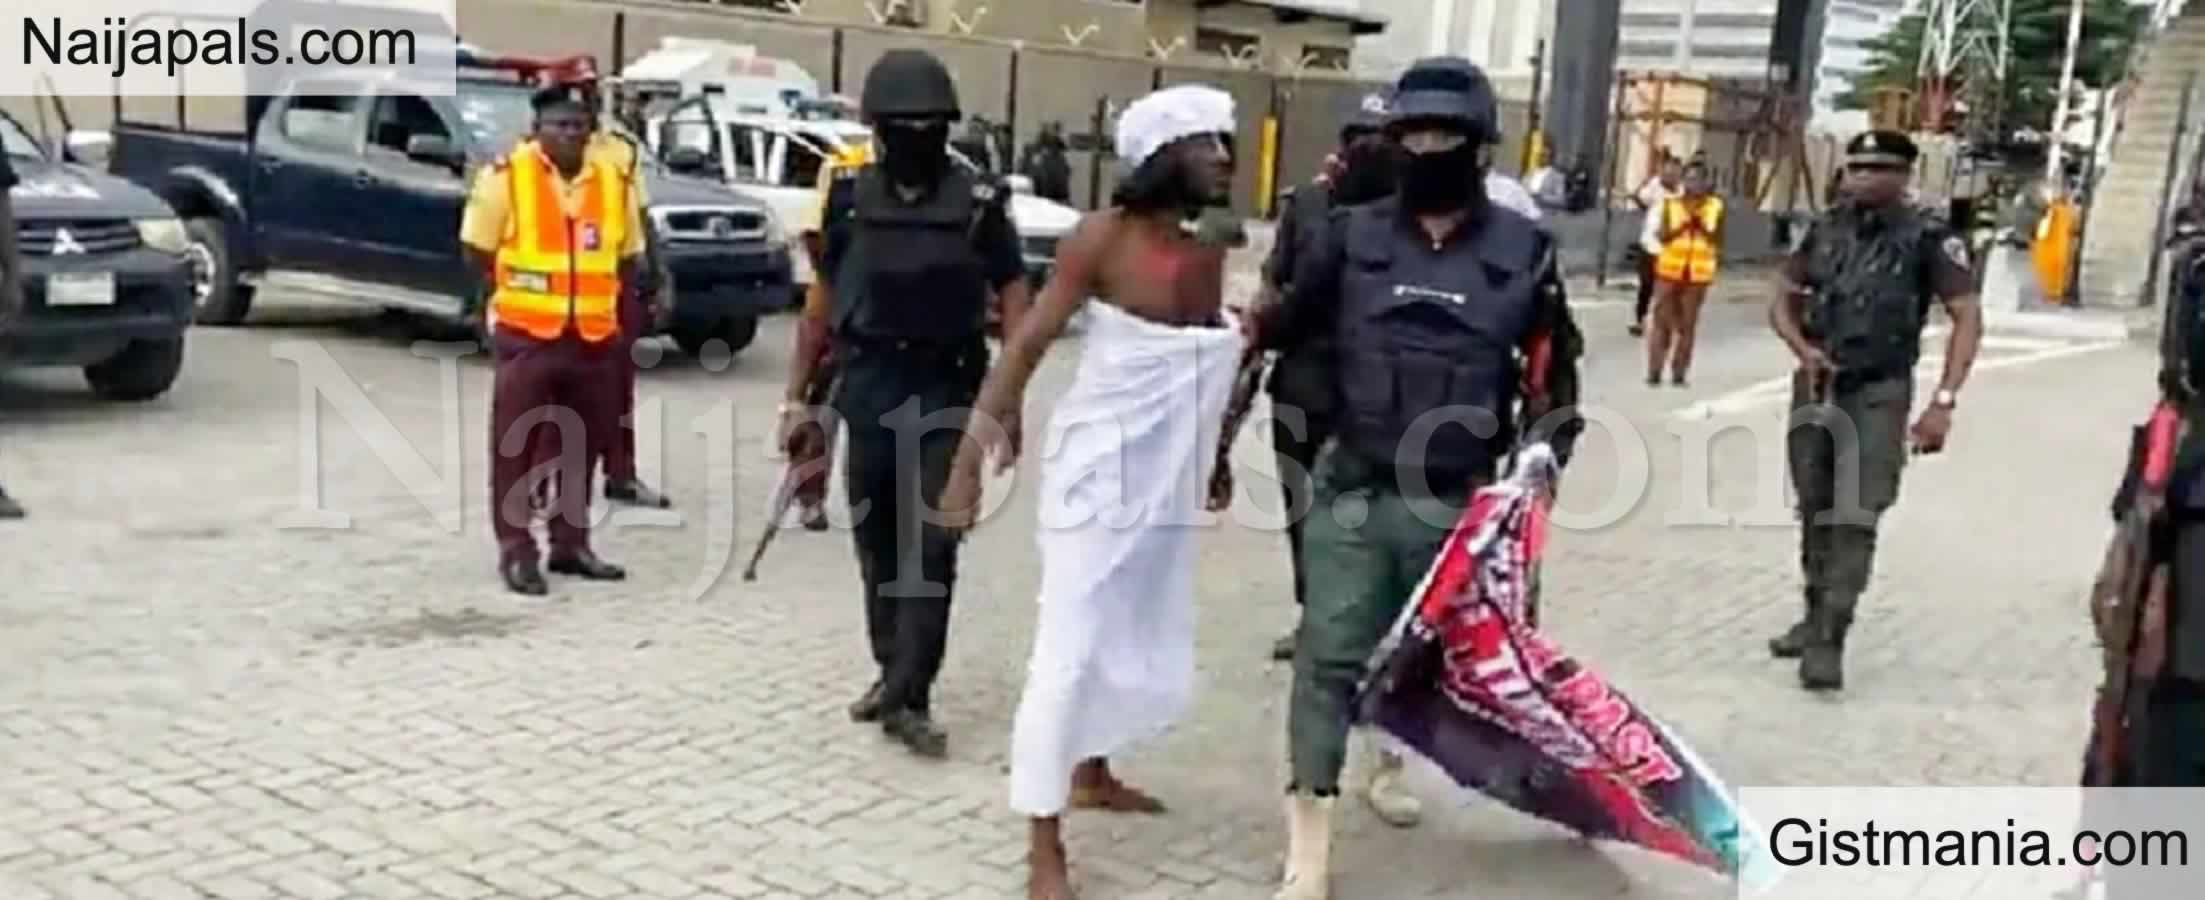 <img alt='.' class='lazyload' data-src='https://img.gistmania.com/emot/video.gif' /> <b>Ifa Priest Arrested By Police At Lekki Tollgate EndSARS Memorial Demonstration</b> (Video)